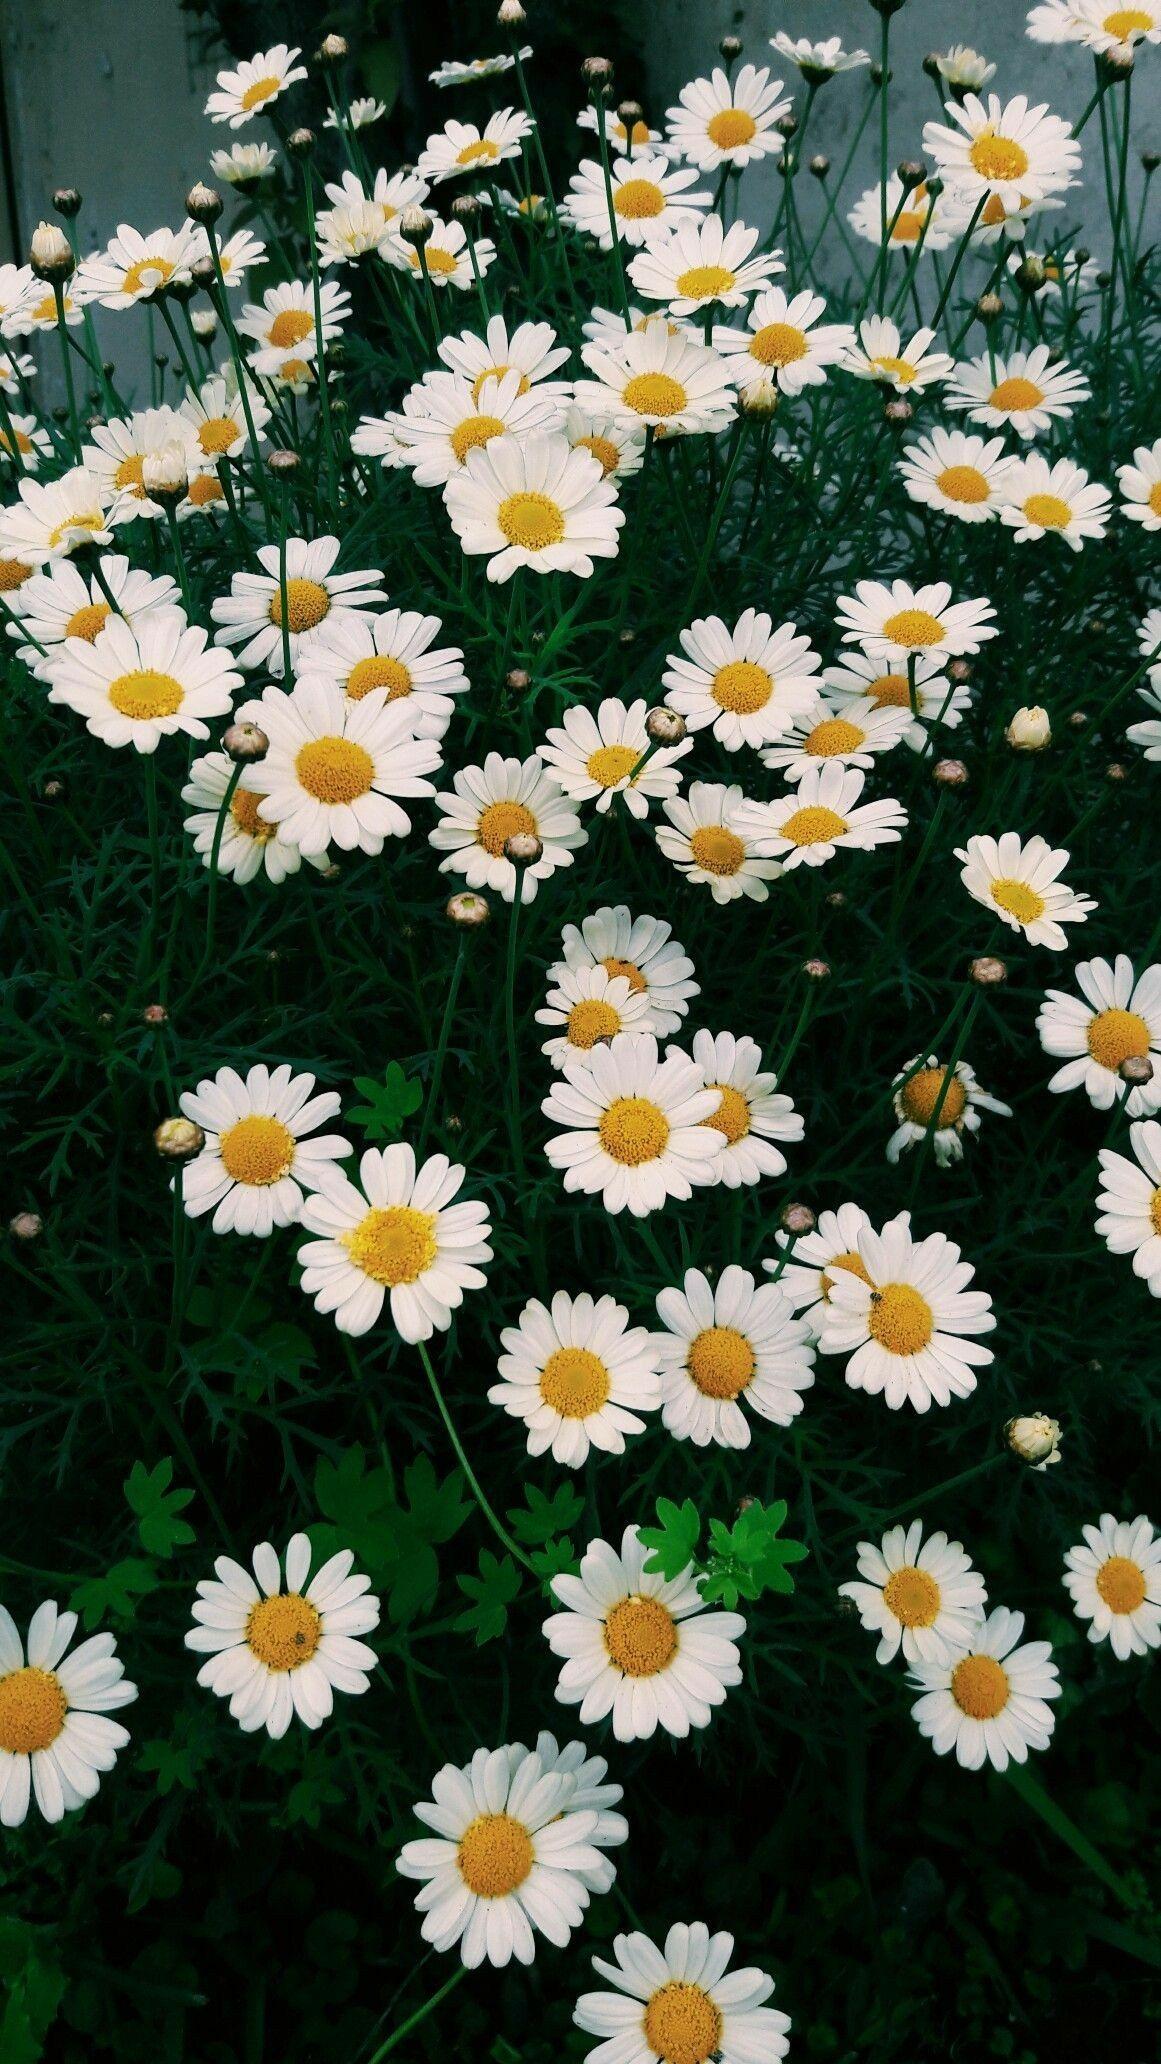 Pin by Hannah Sanfilippo on Photography Flower aesthetic